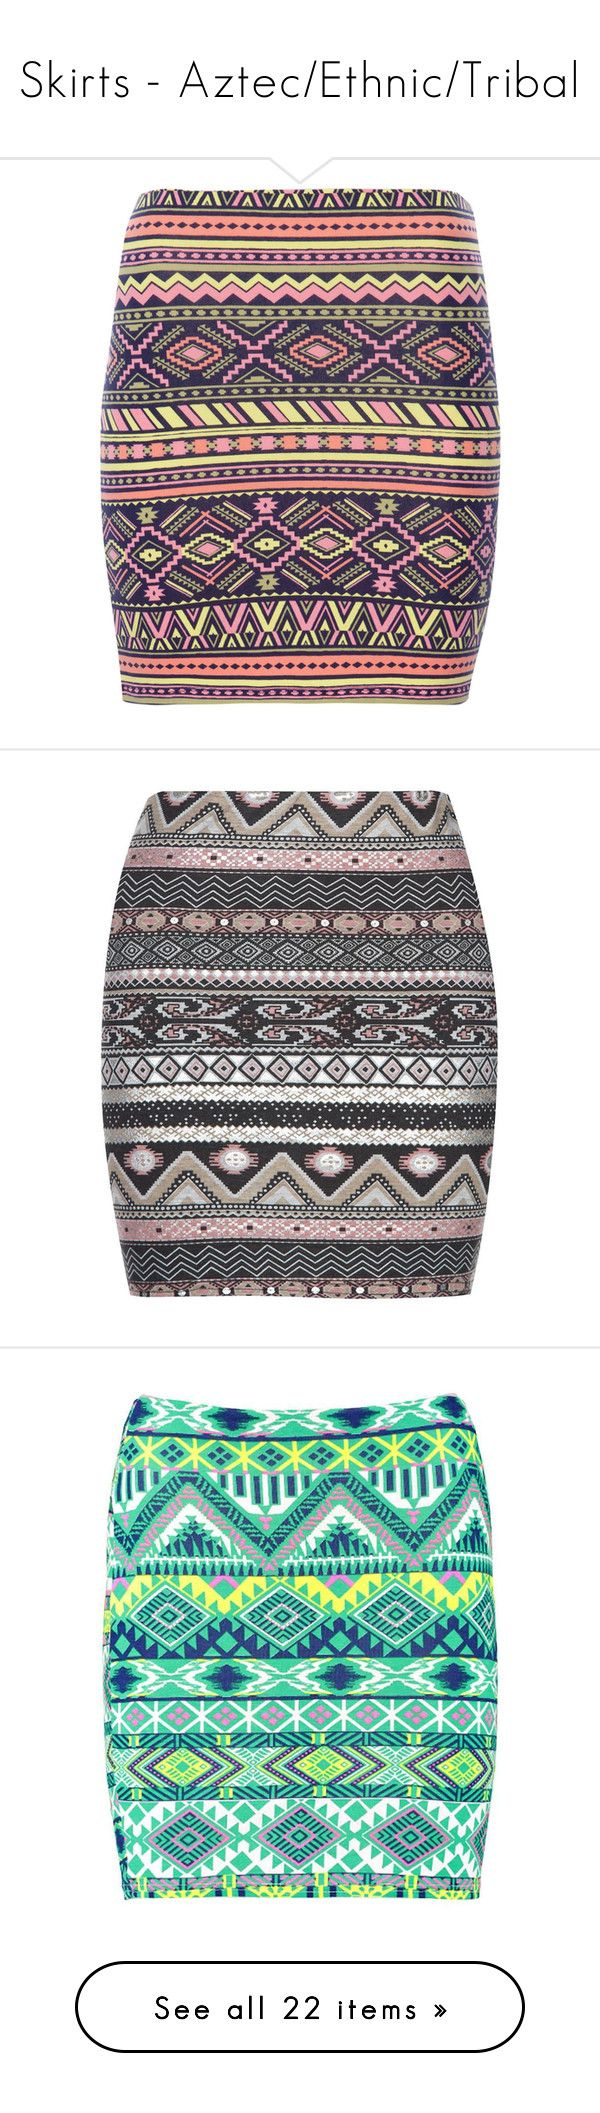 """Skirts - Aztec/Ethnic/Tribal"" by giovanna1995 ❤ liked on Polyvore featuring skirts, saias, bottoms, faldas, jupes, indigo, tribal skirt, purple skirt, tribal print skirt and tube skirt"